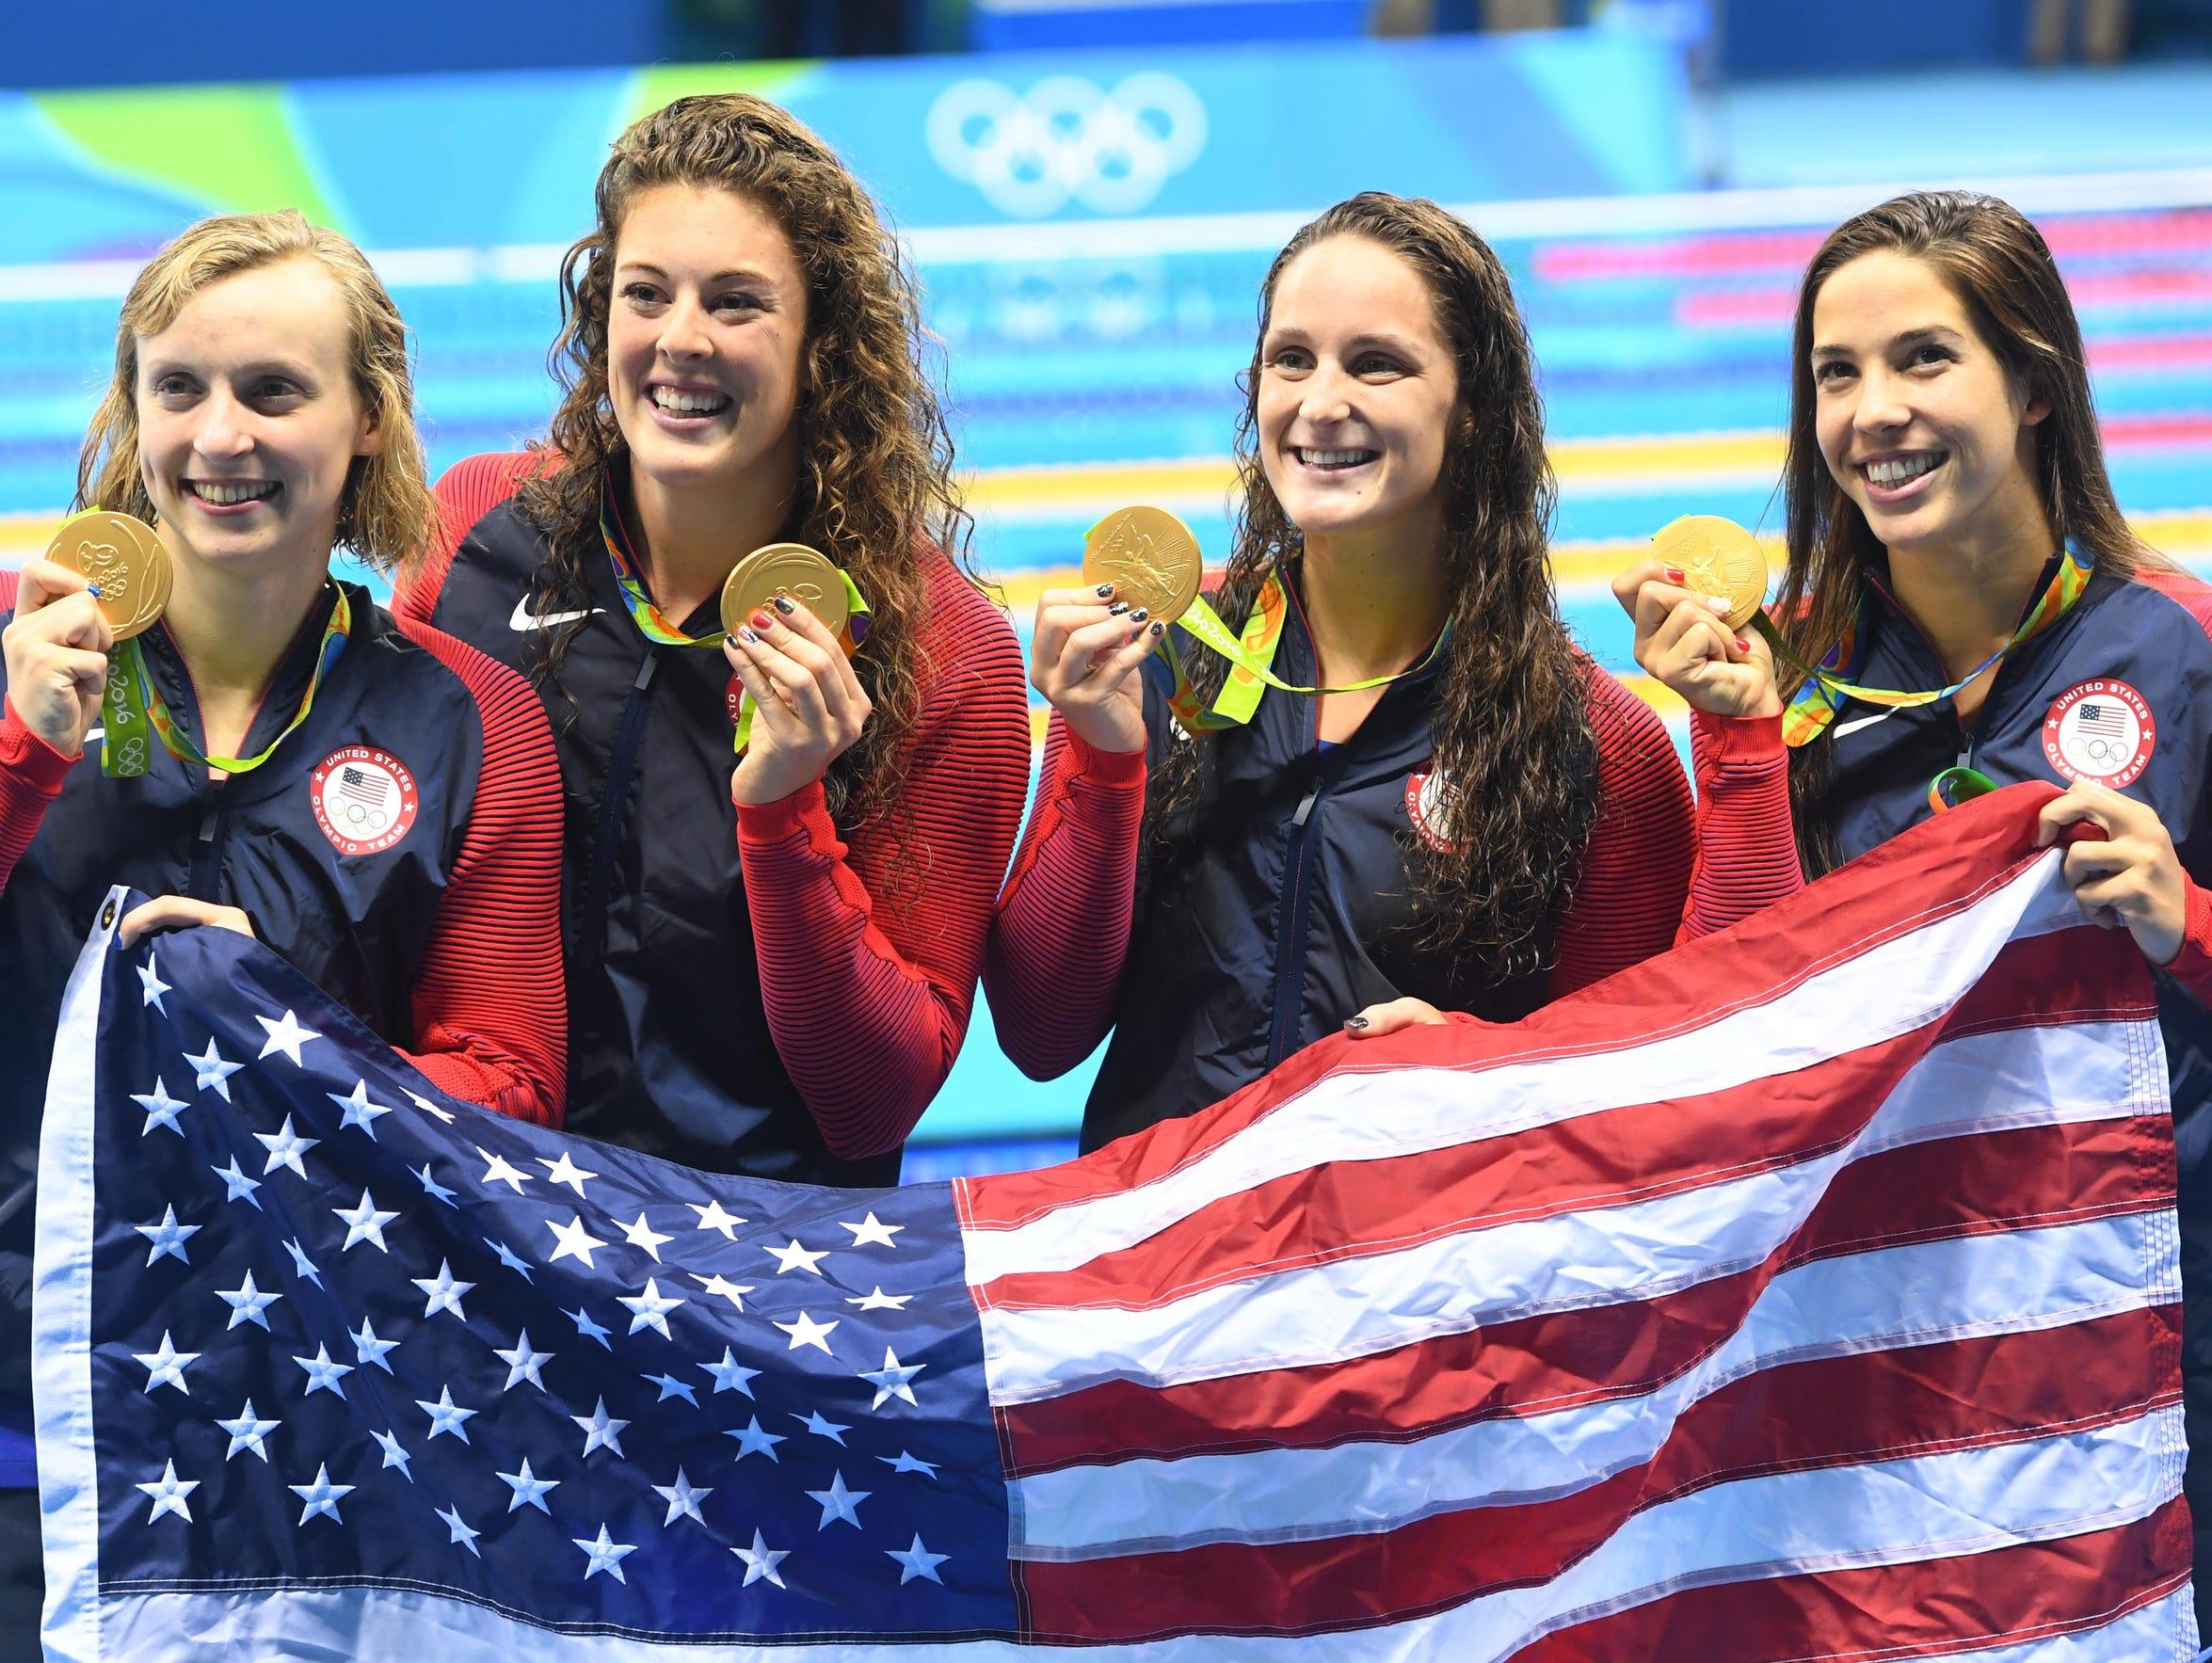 Allison Schmitt, second from left, celebrates her gold